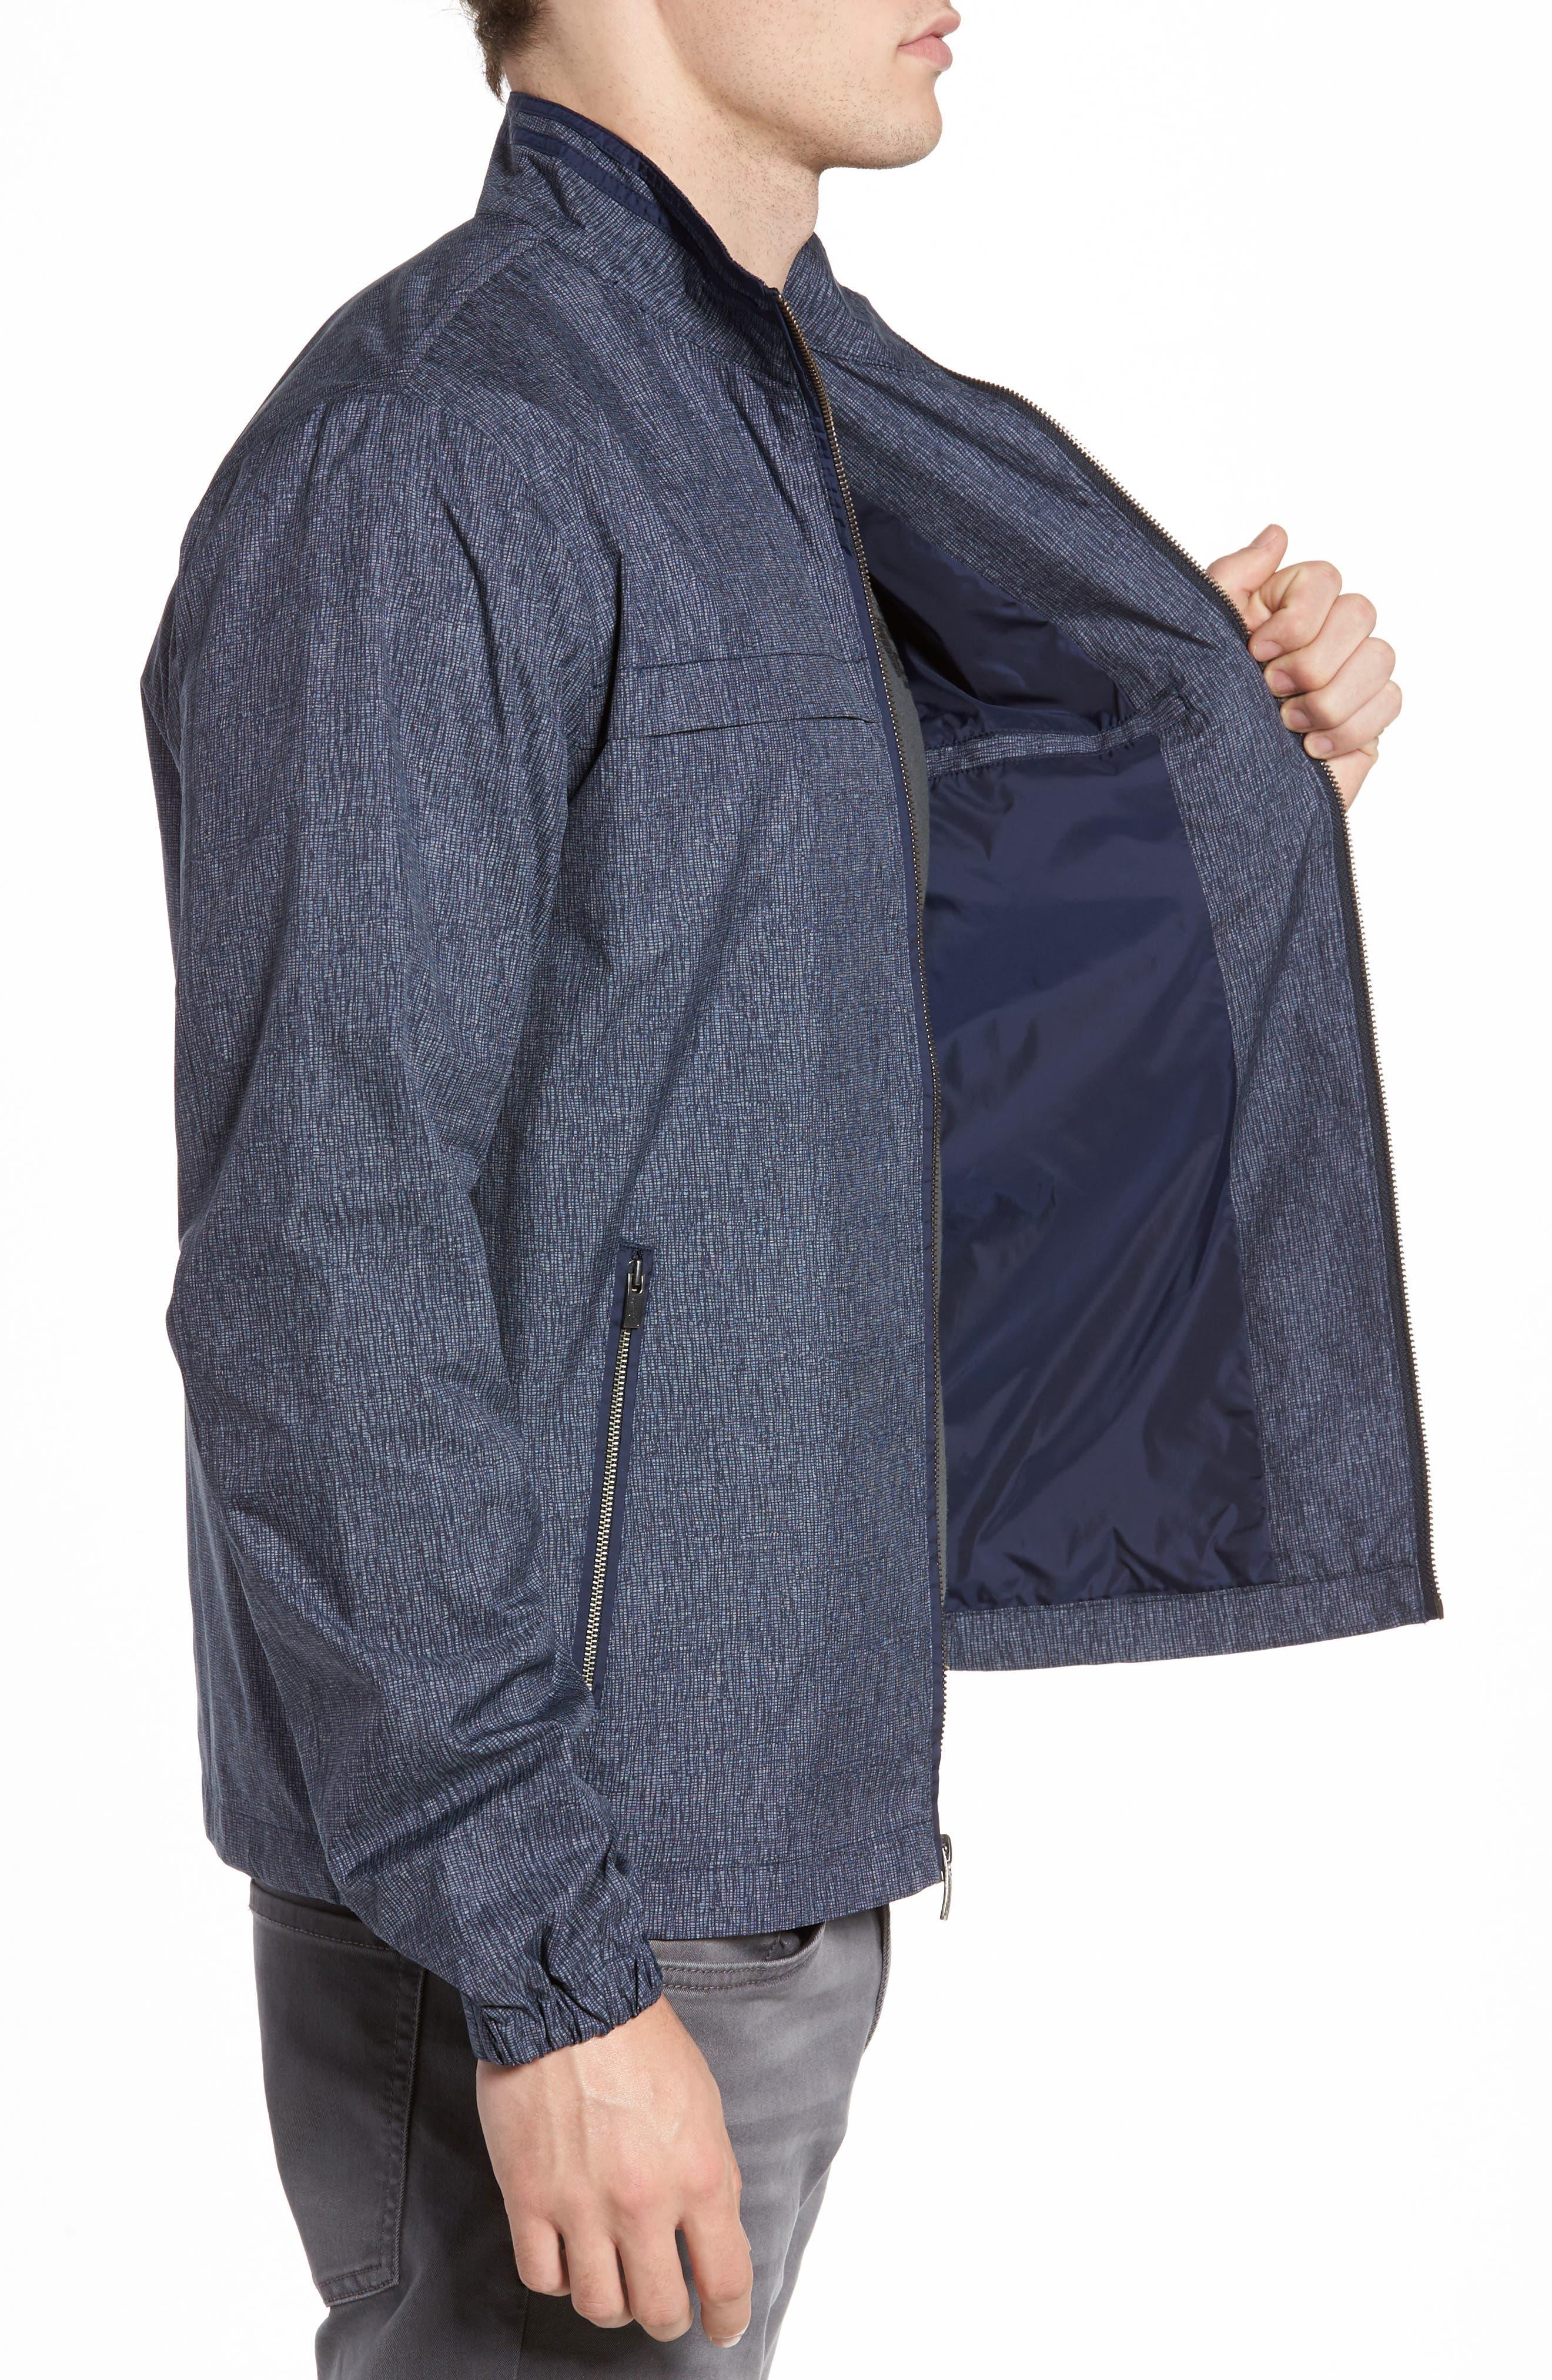 Ratner Water Resistant Jacket,                             Alternate thumbnail 3, color,